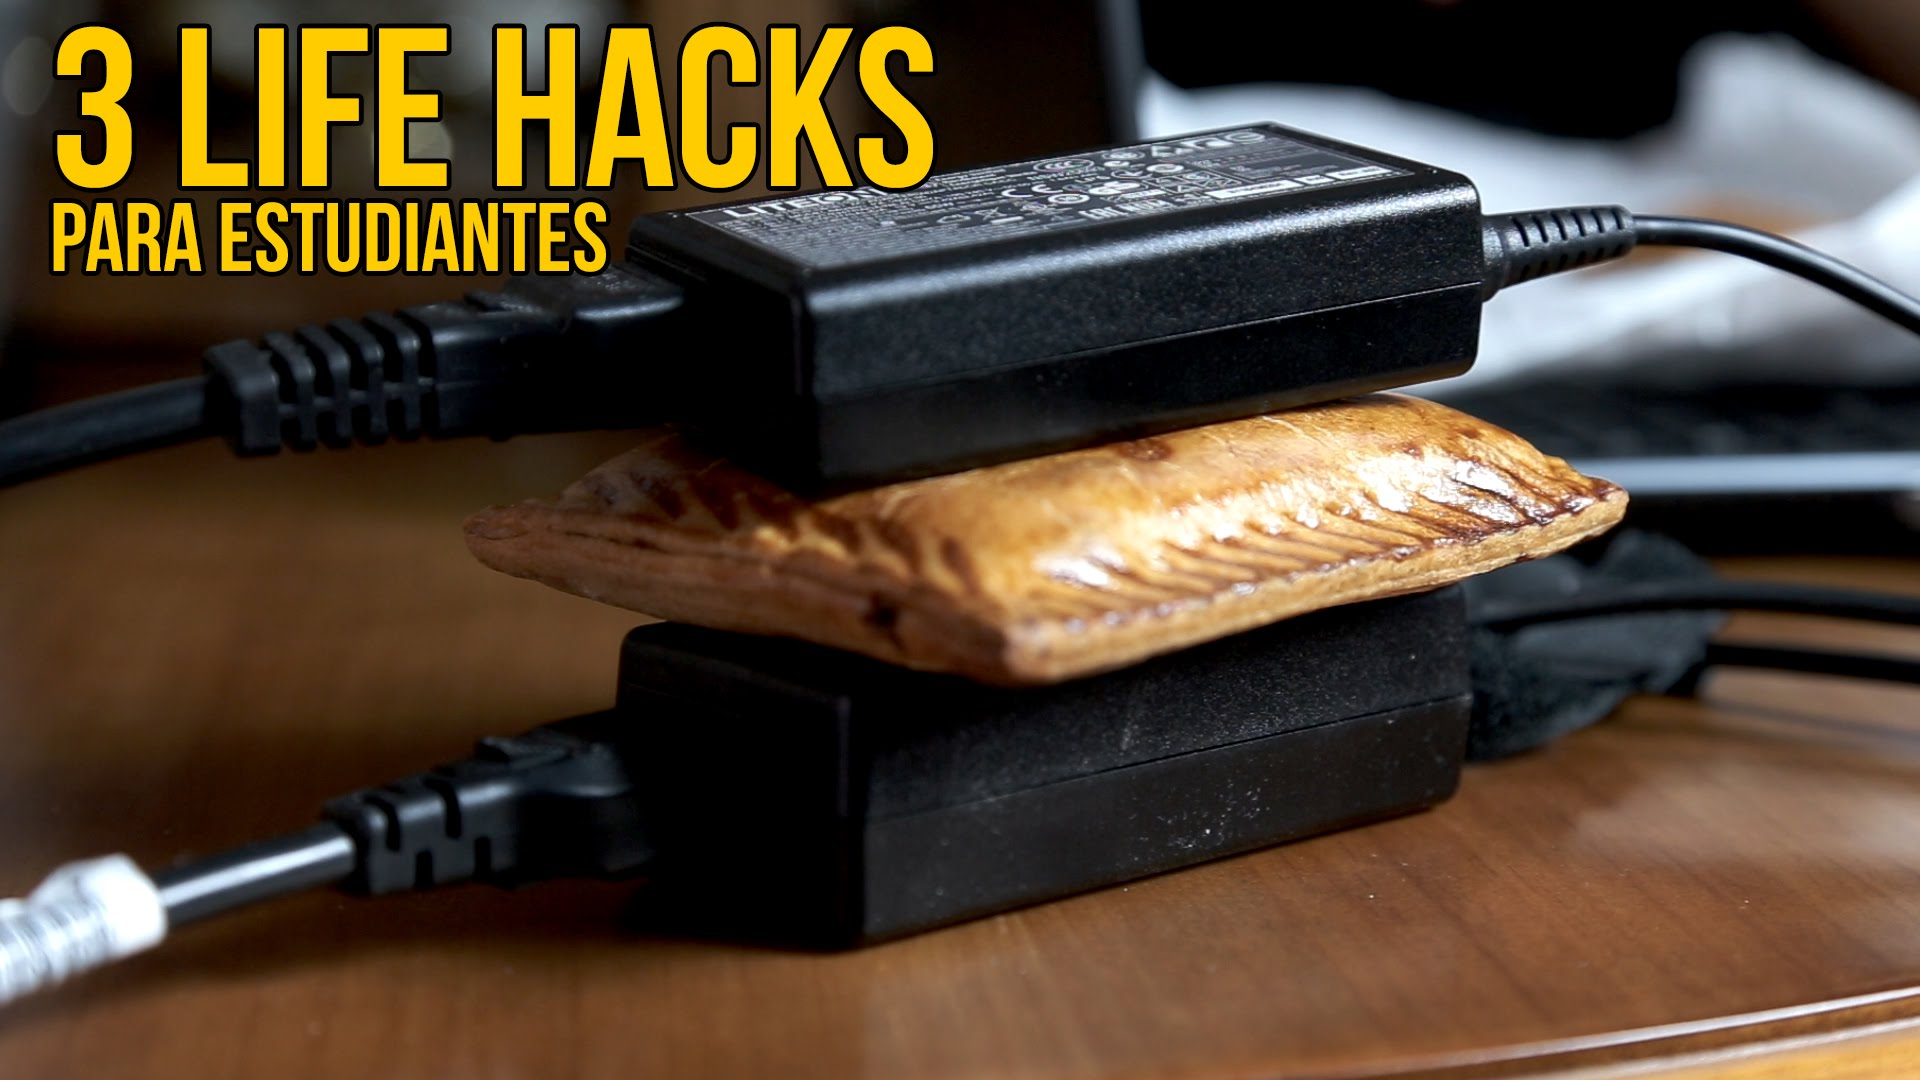 3 life hacks para estudiantes